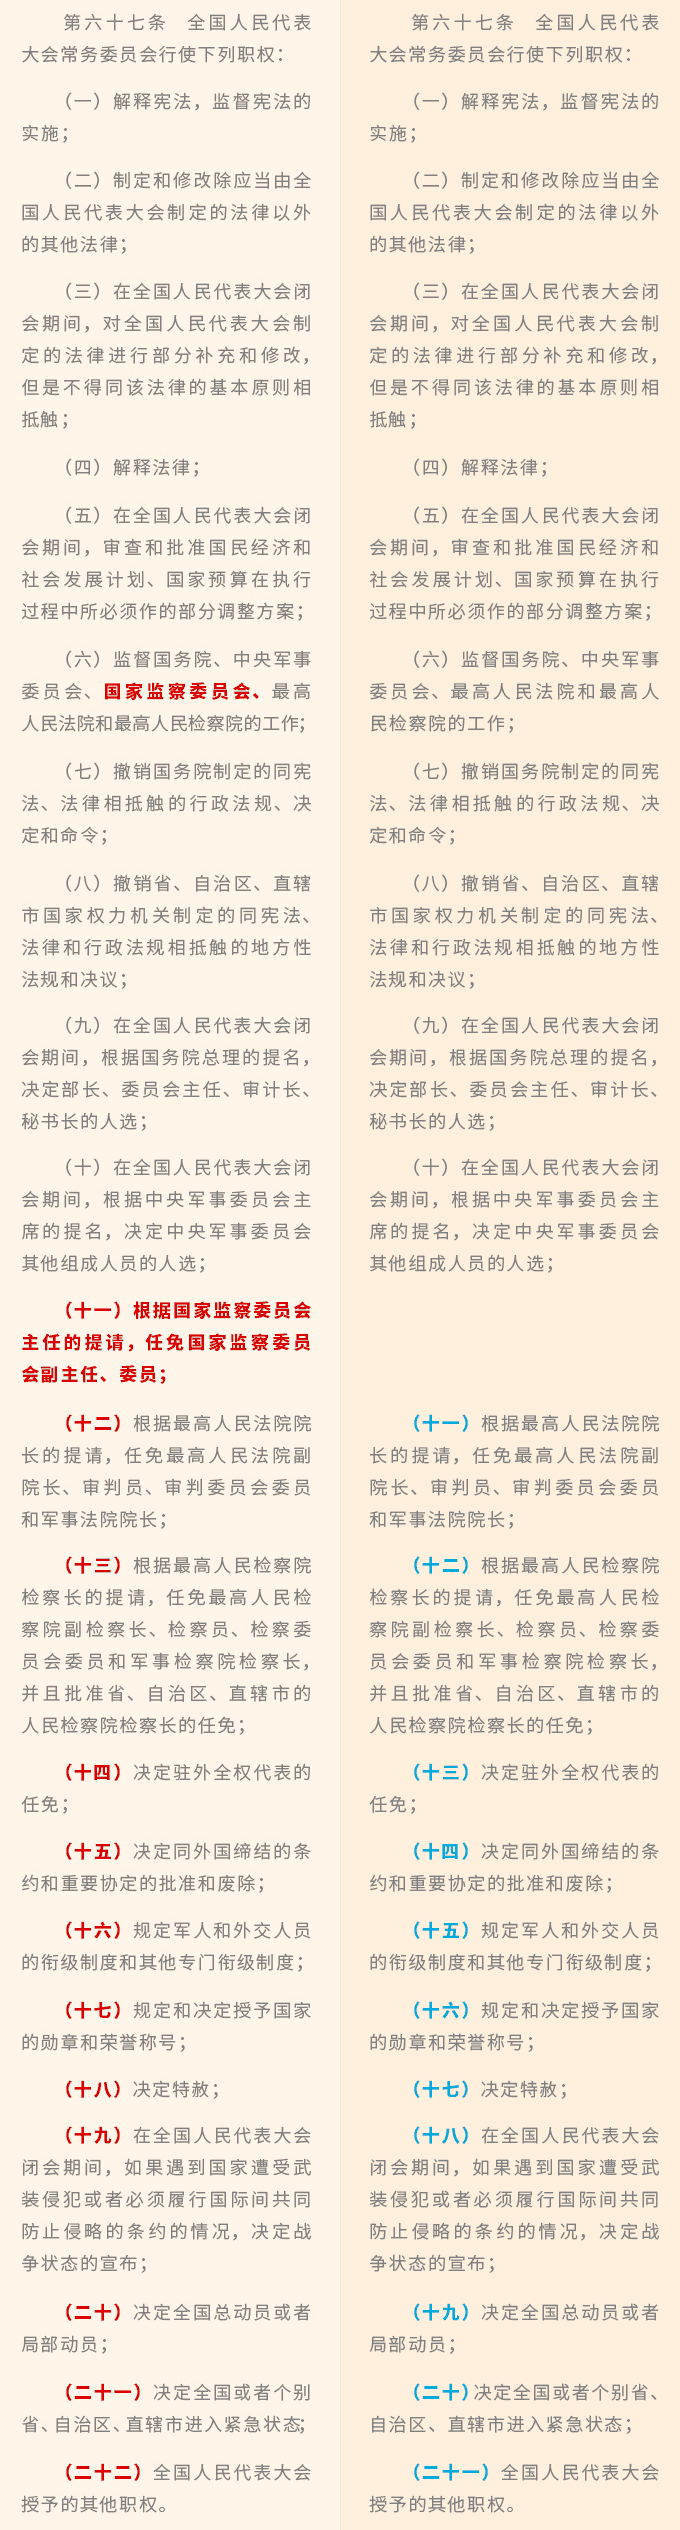 http://www.ccdi.gov.cn/toutiao/201803/W020180309744769185686.png